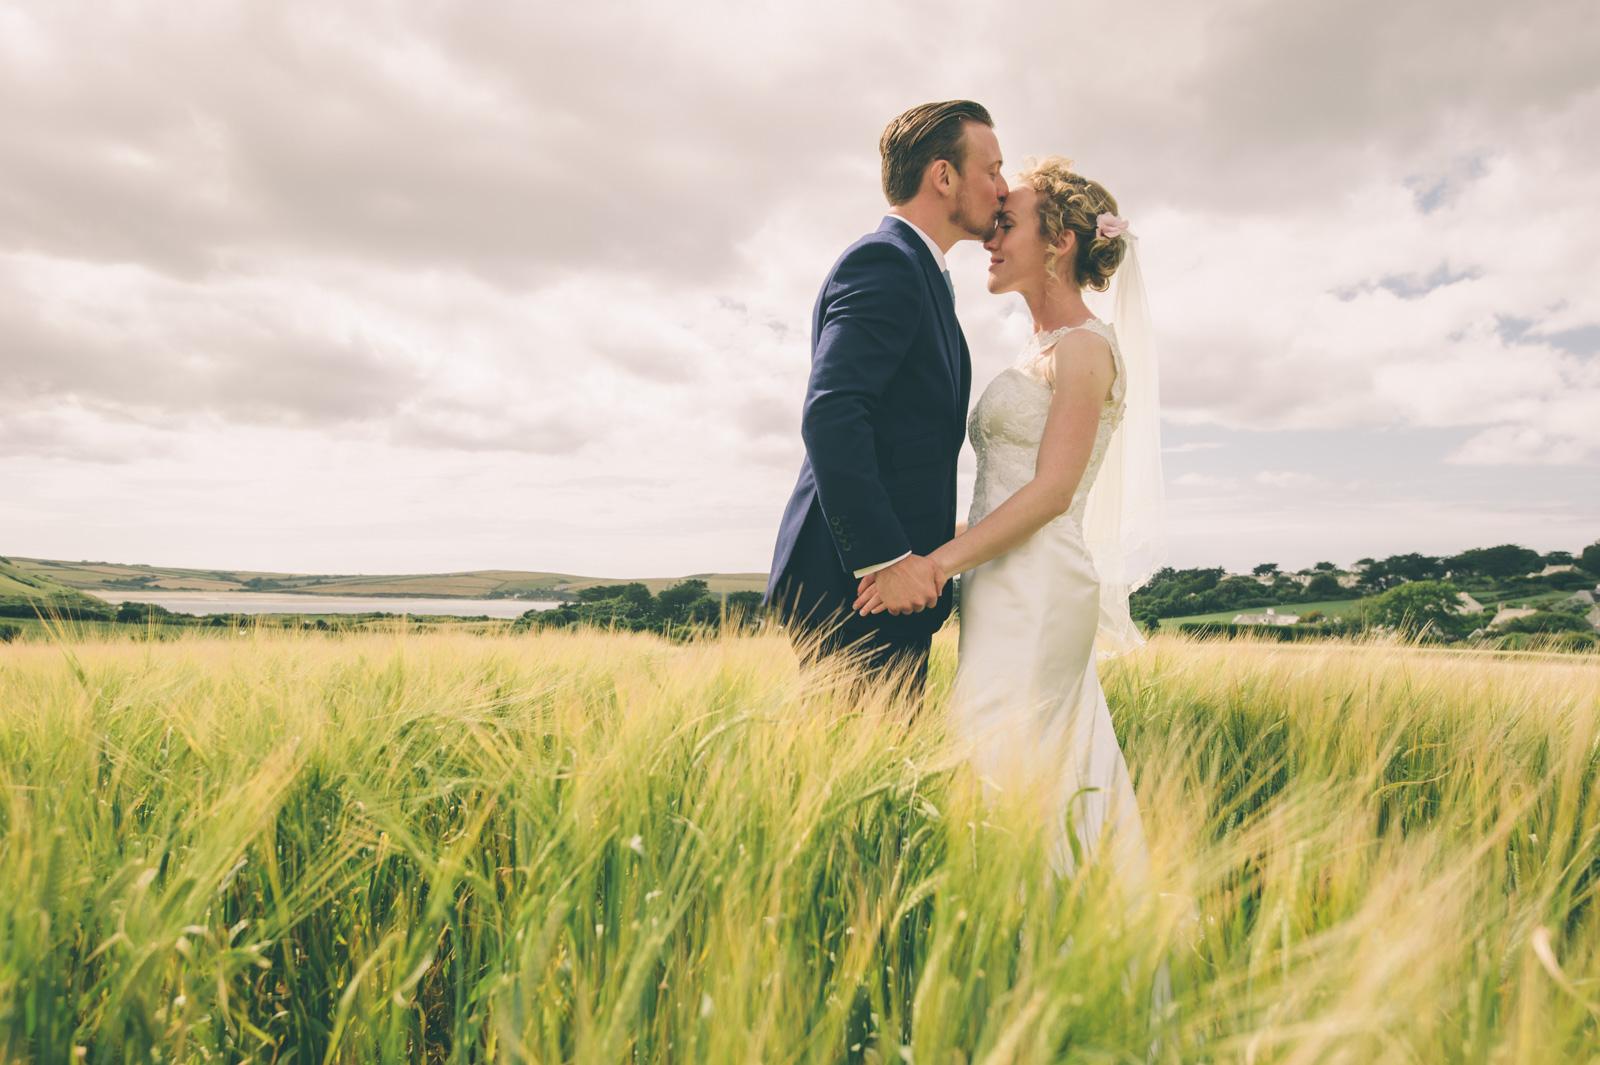 wedding-photography-rock-100.jpg